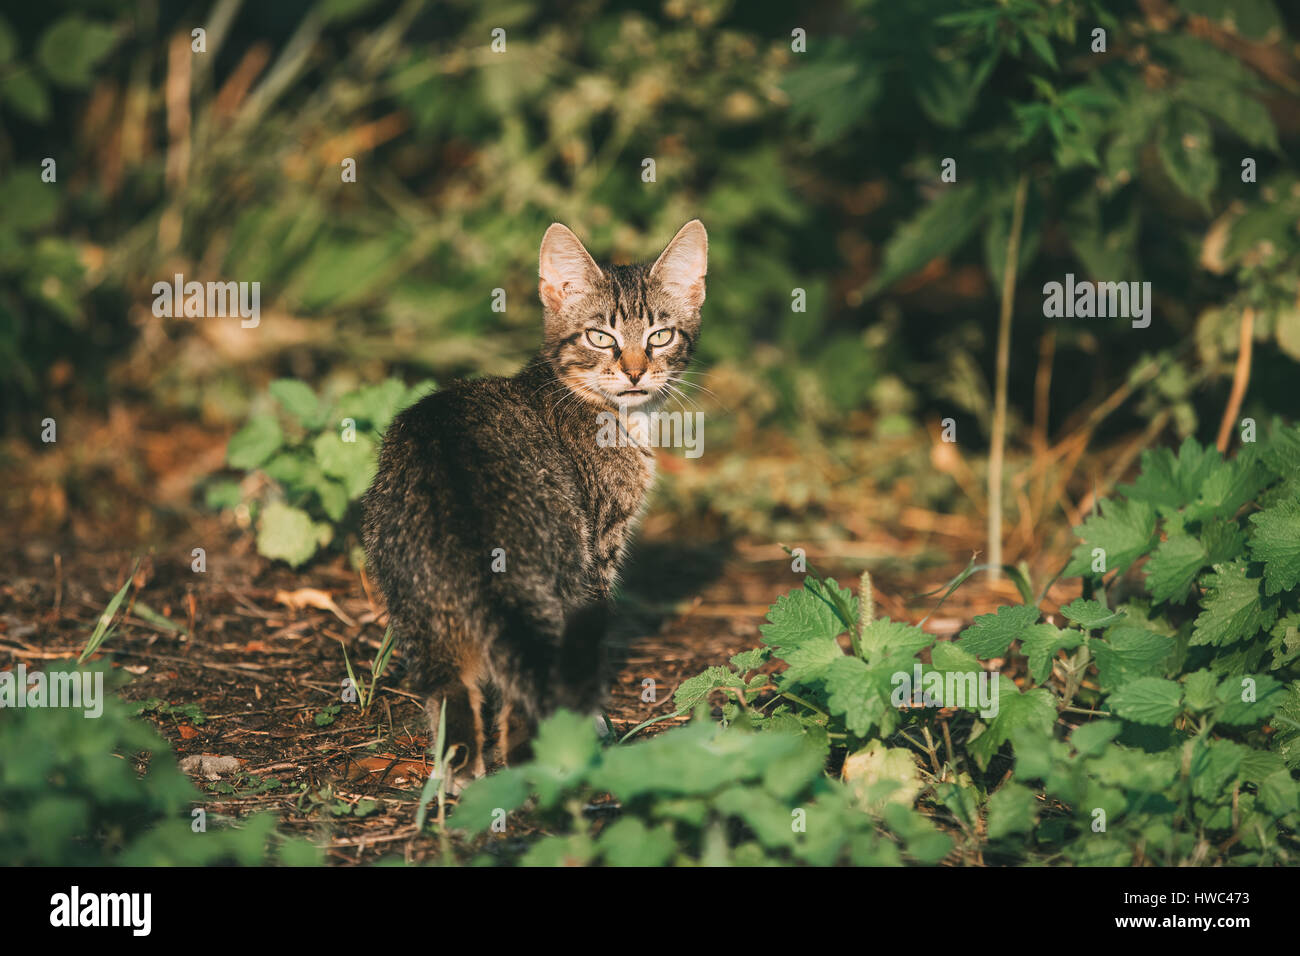 Kitten Hunting Imágenes De Stock & Kitten Hunting Fotos De Stock - Alamy